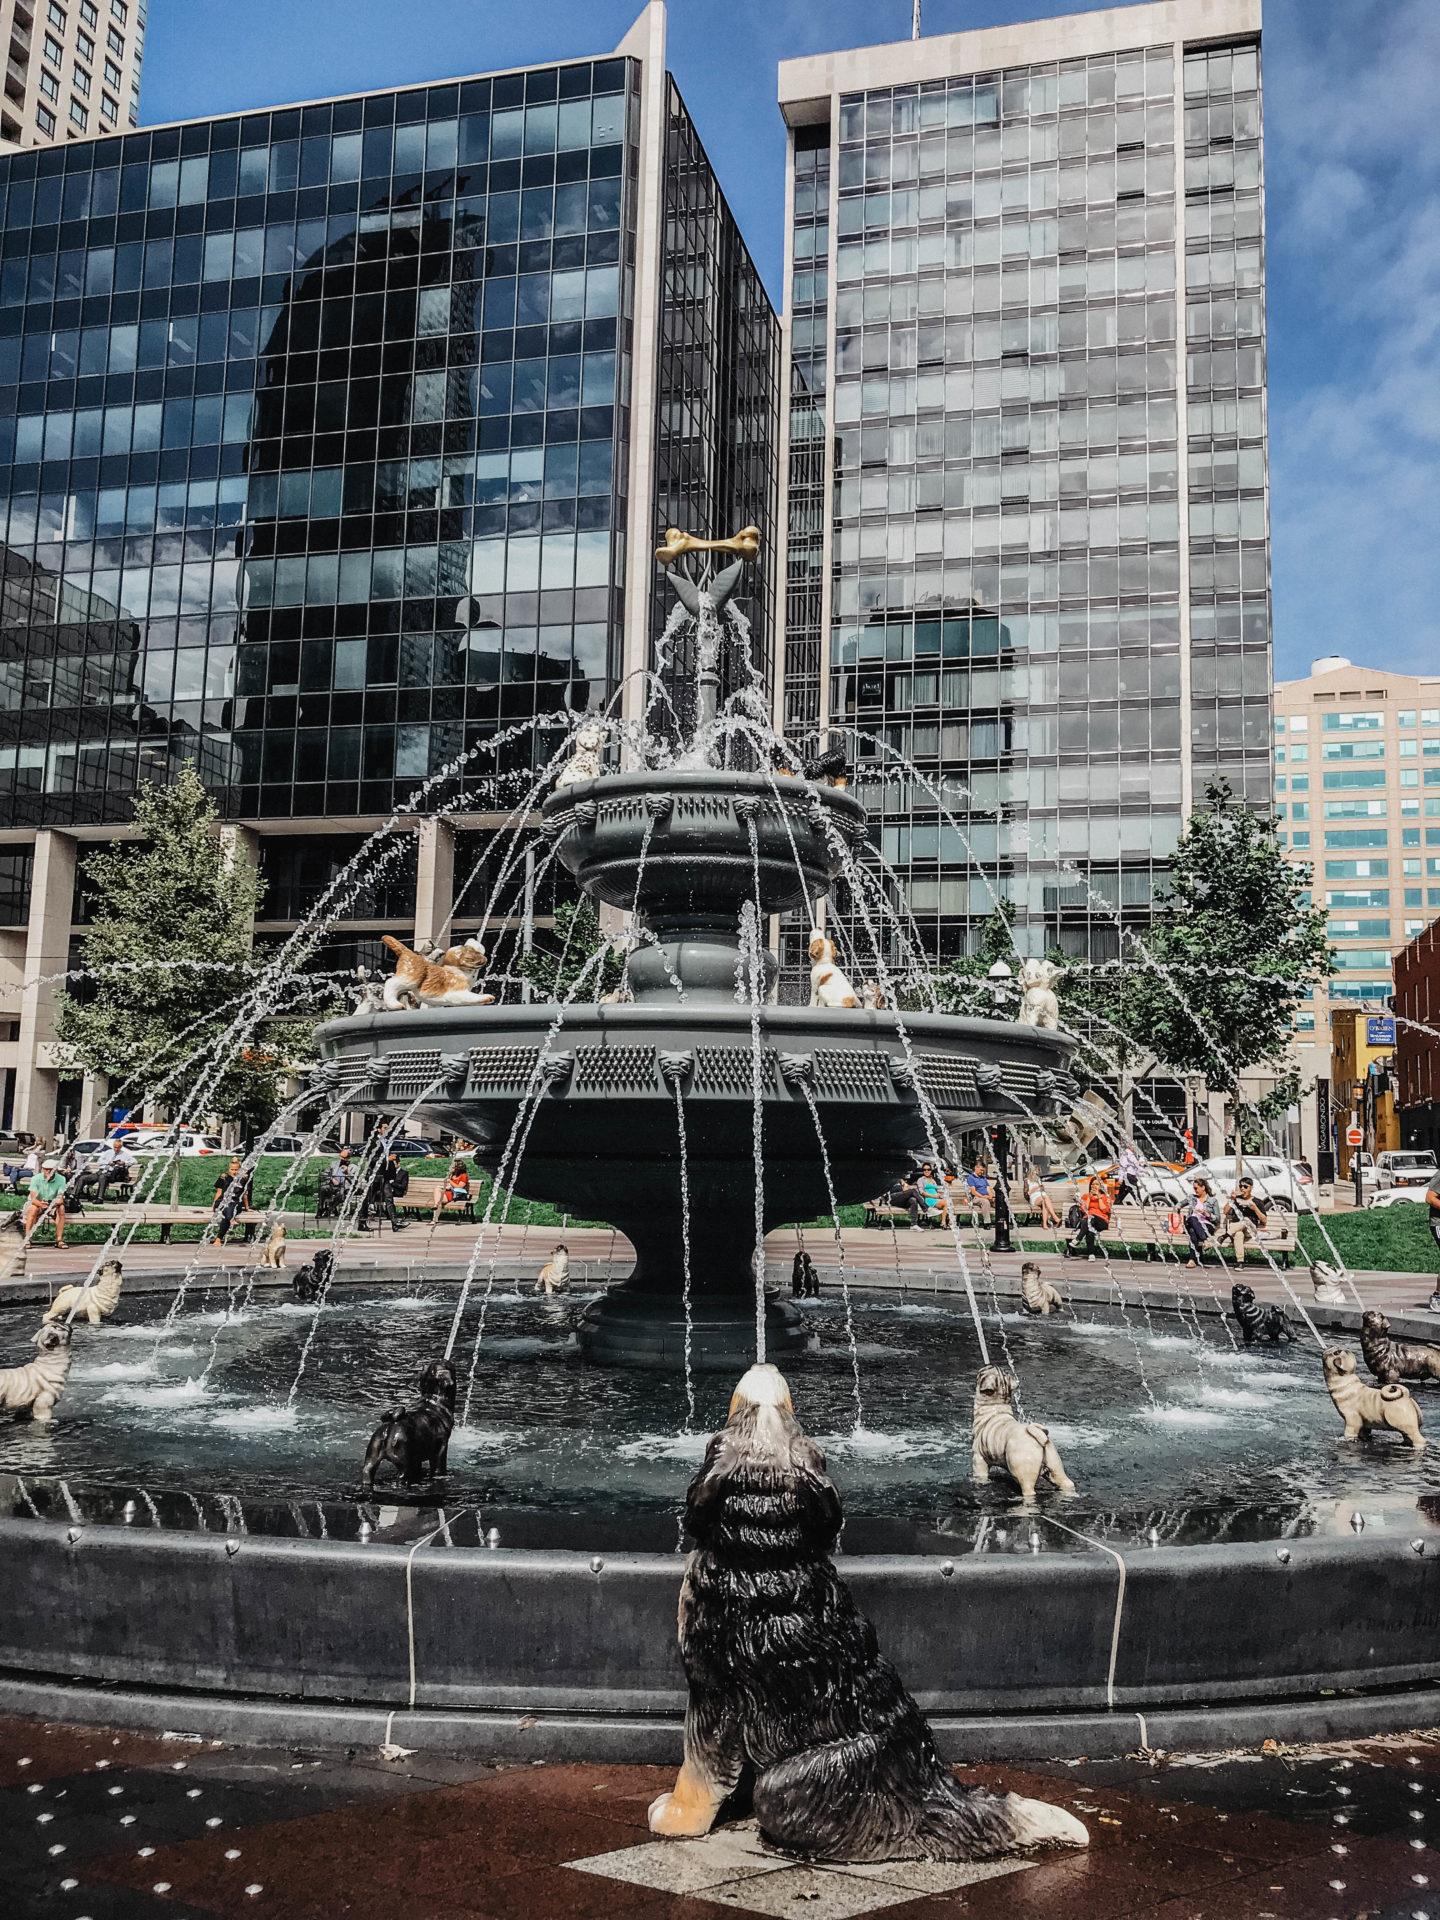 Berczy Park fontaine chiens Toronto